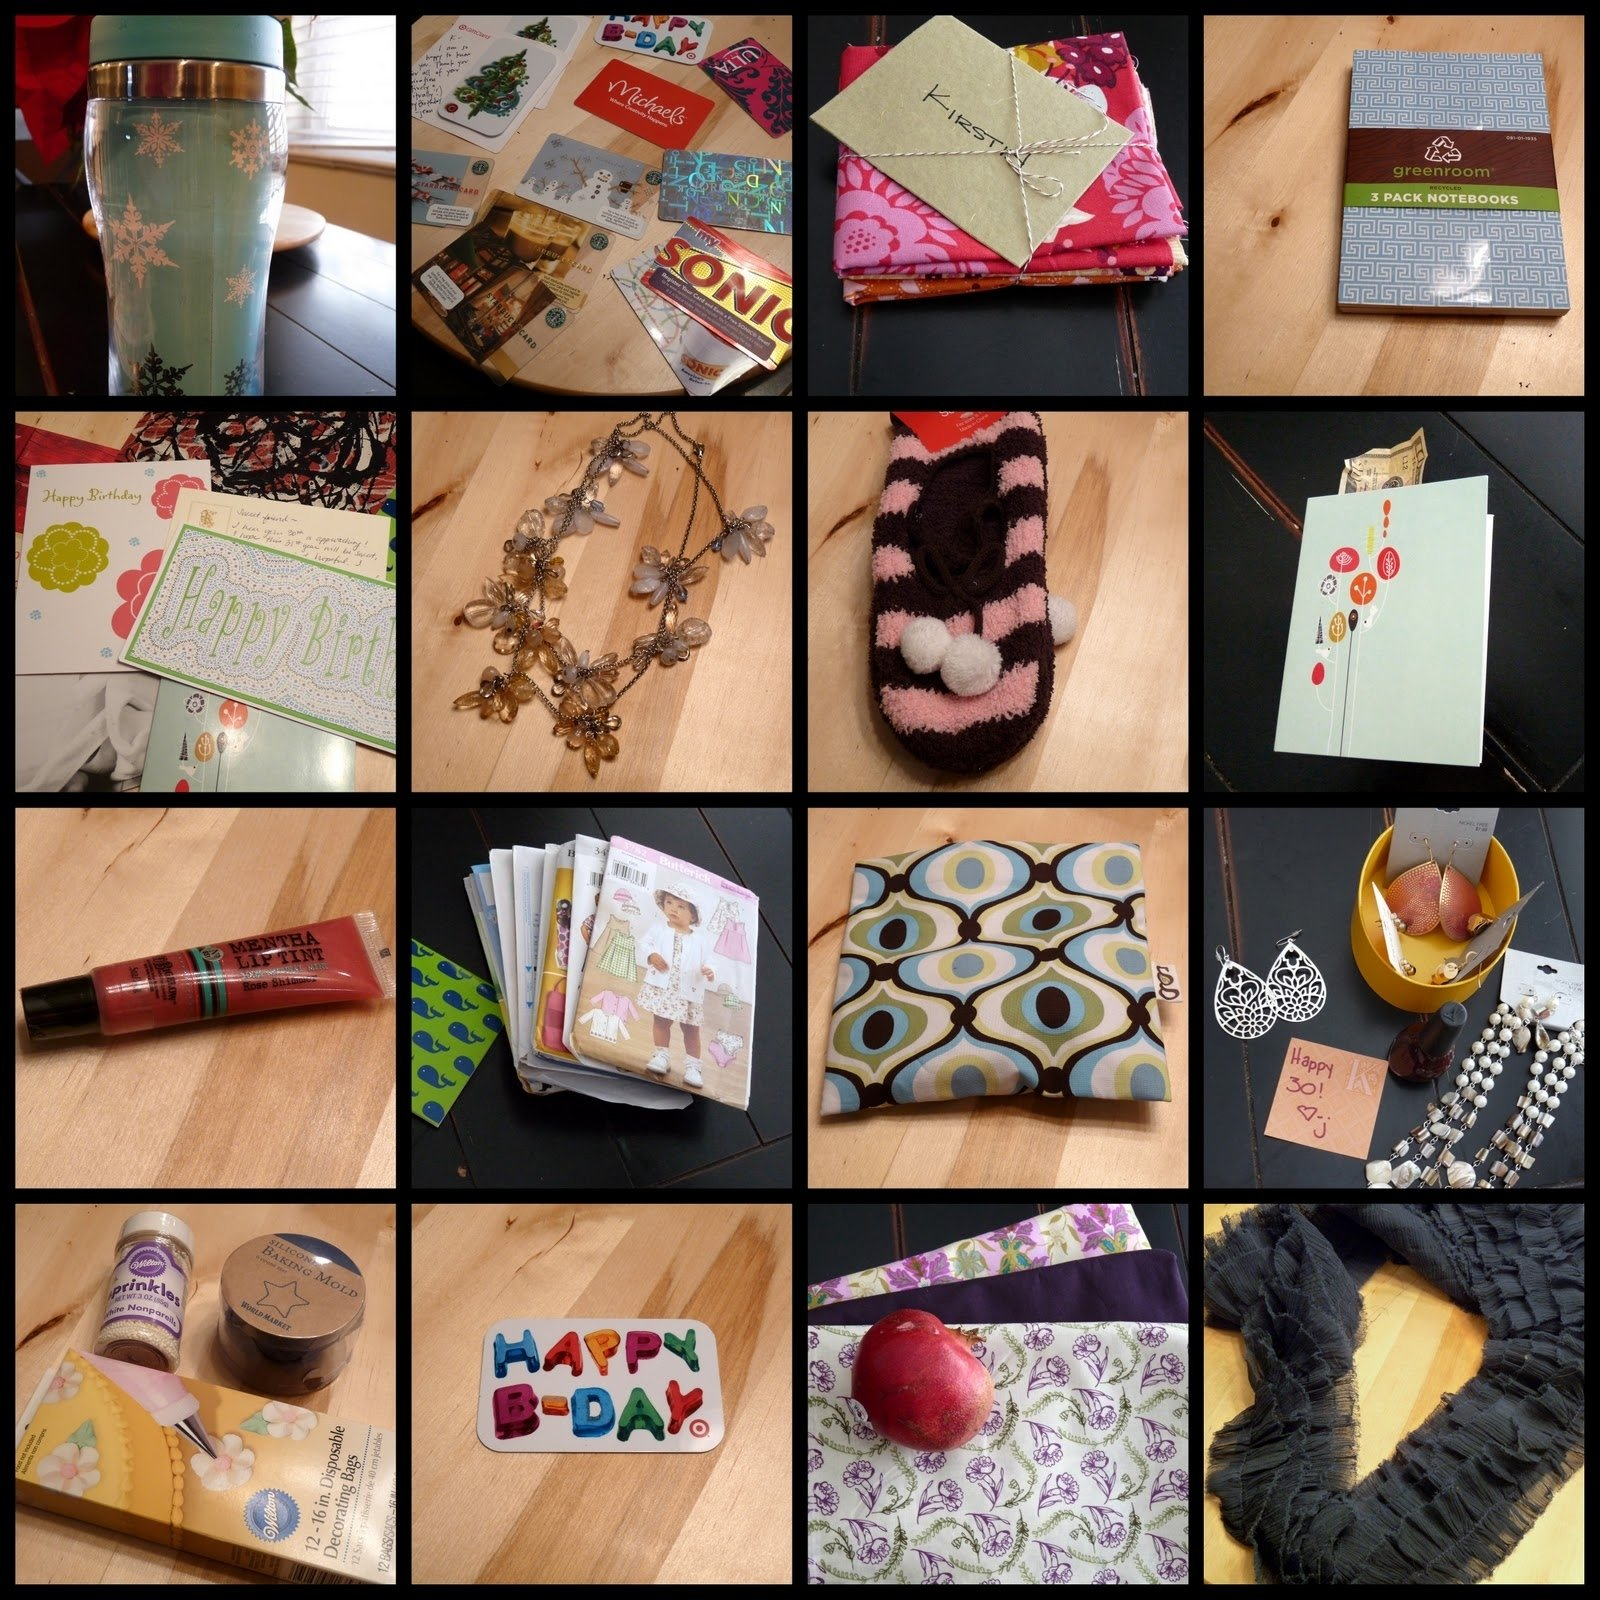 10 Stylish Birthday Ideas For Turning 30 best birthday month ever 2 2020